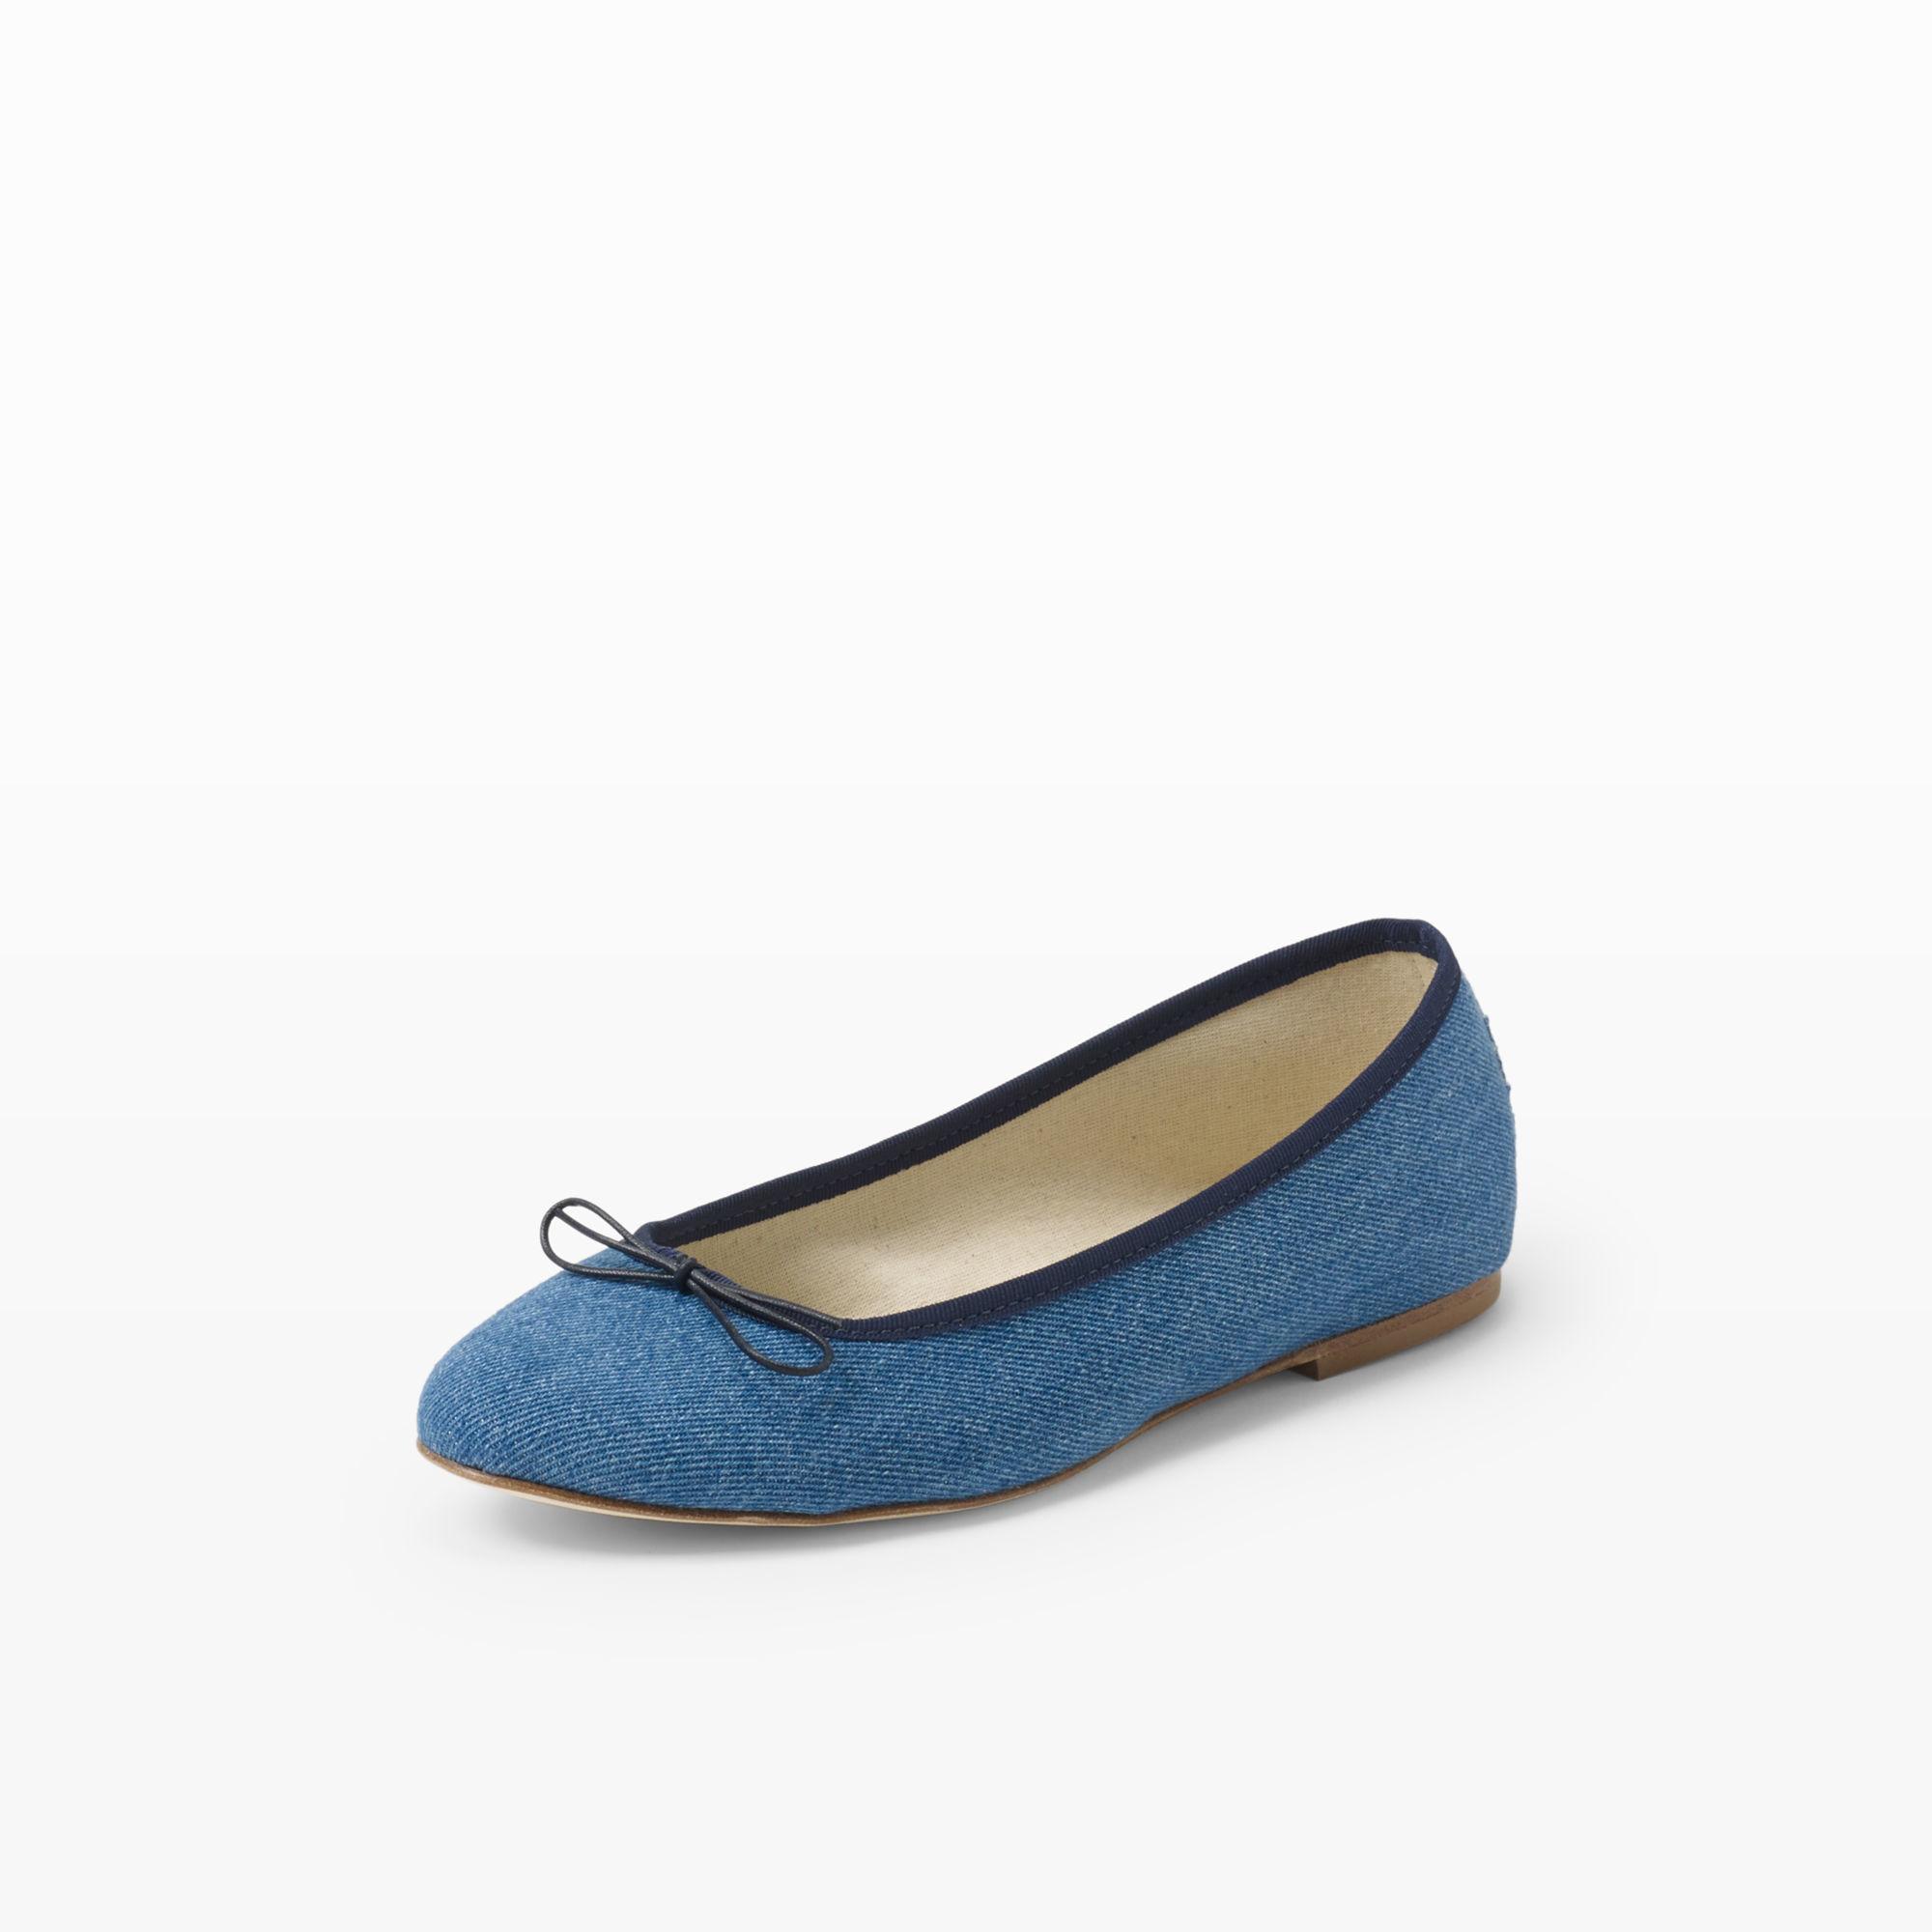 Club monaco Anniel Ballet Flat in Blue